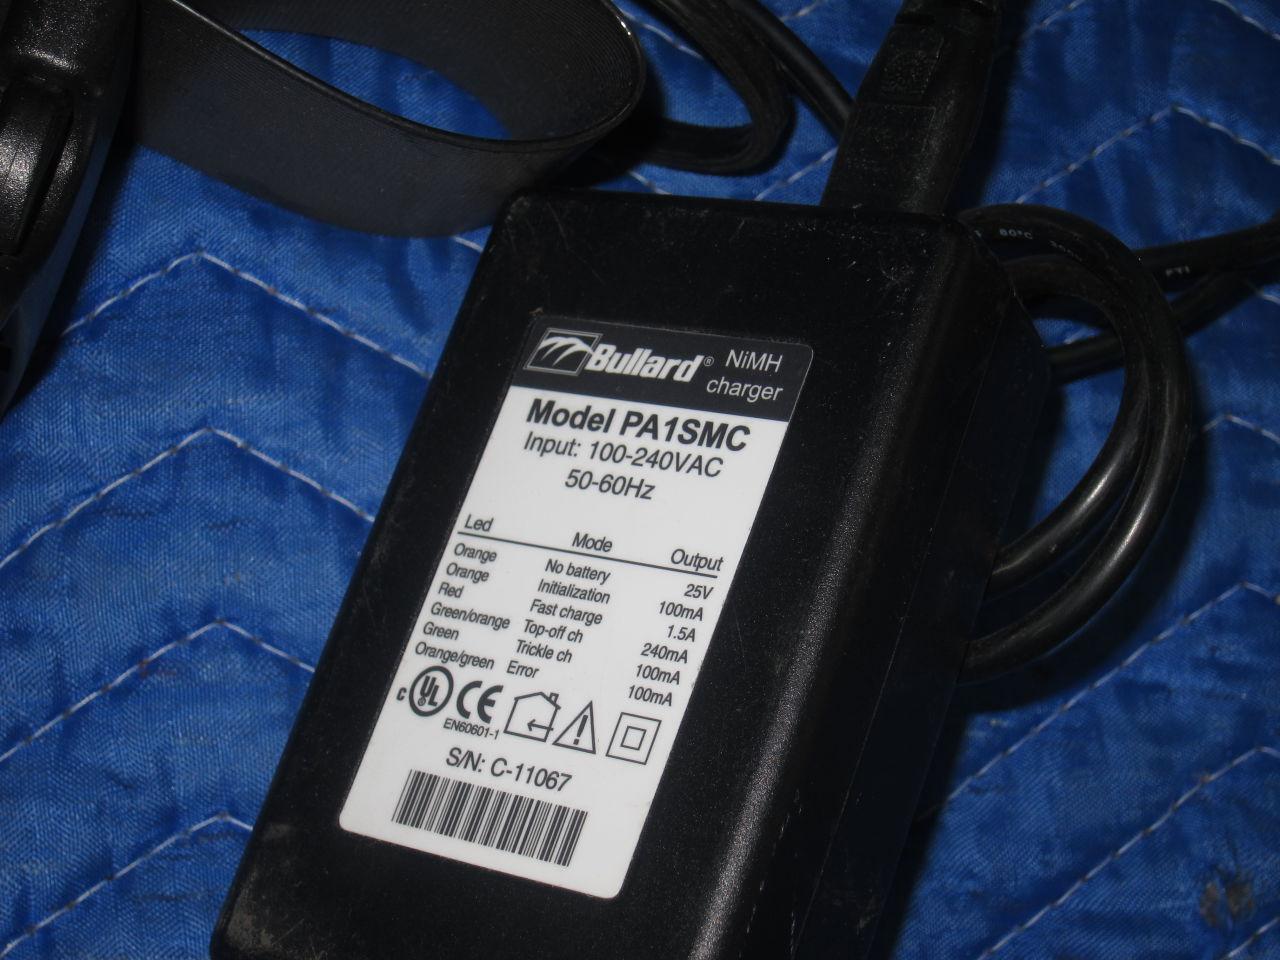 BULLARD PA20 Model PA1SMC Respirator